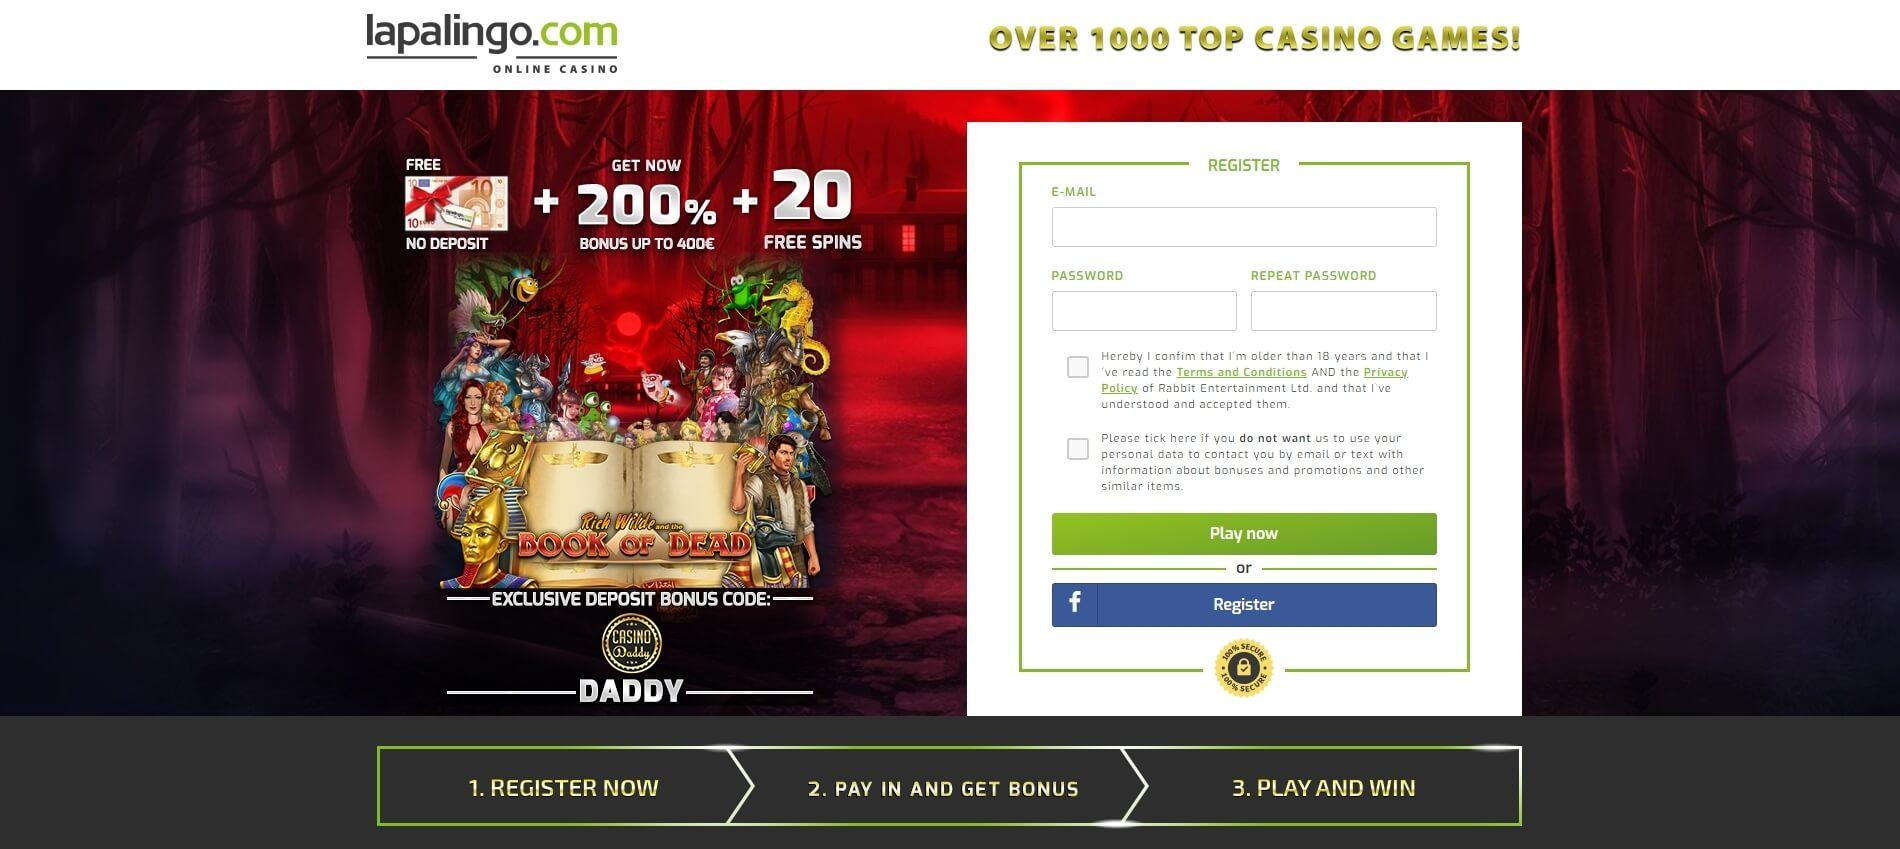 Anmeldebonus online casino